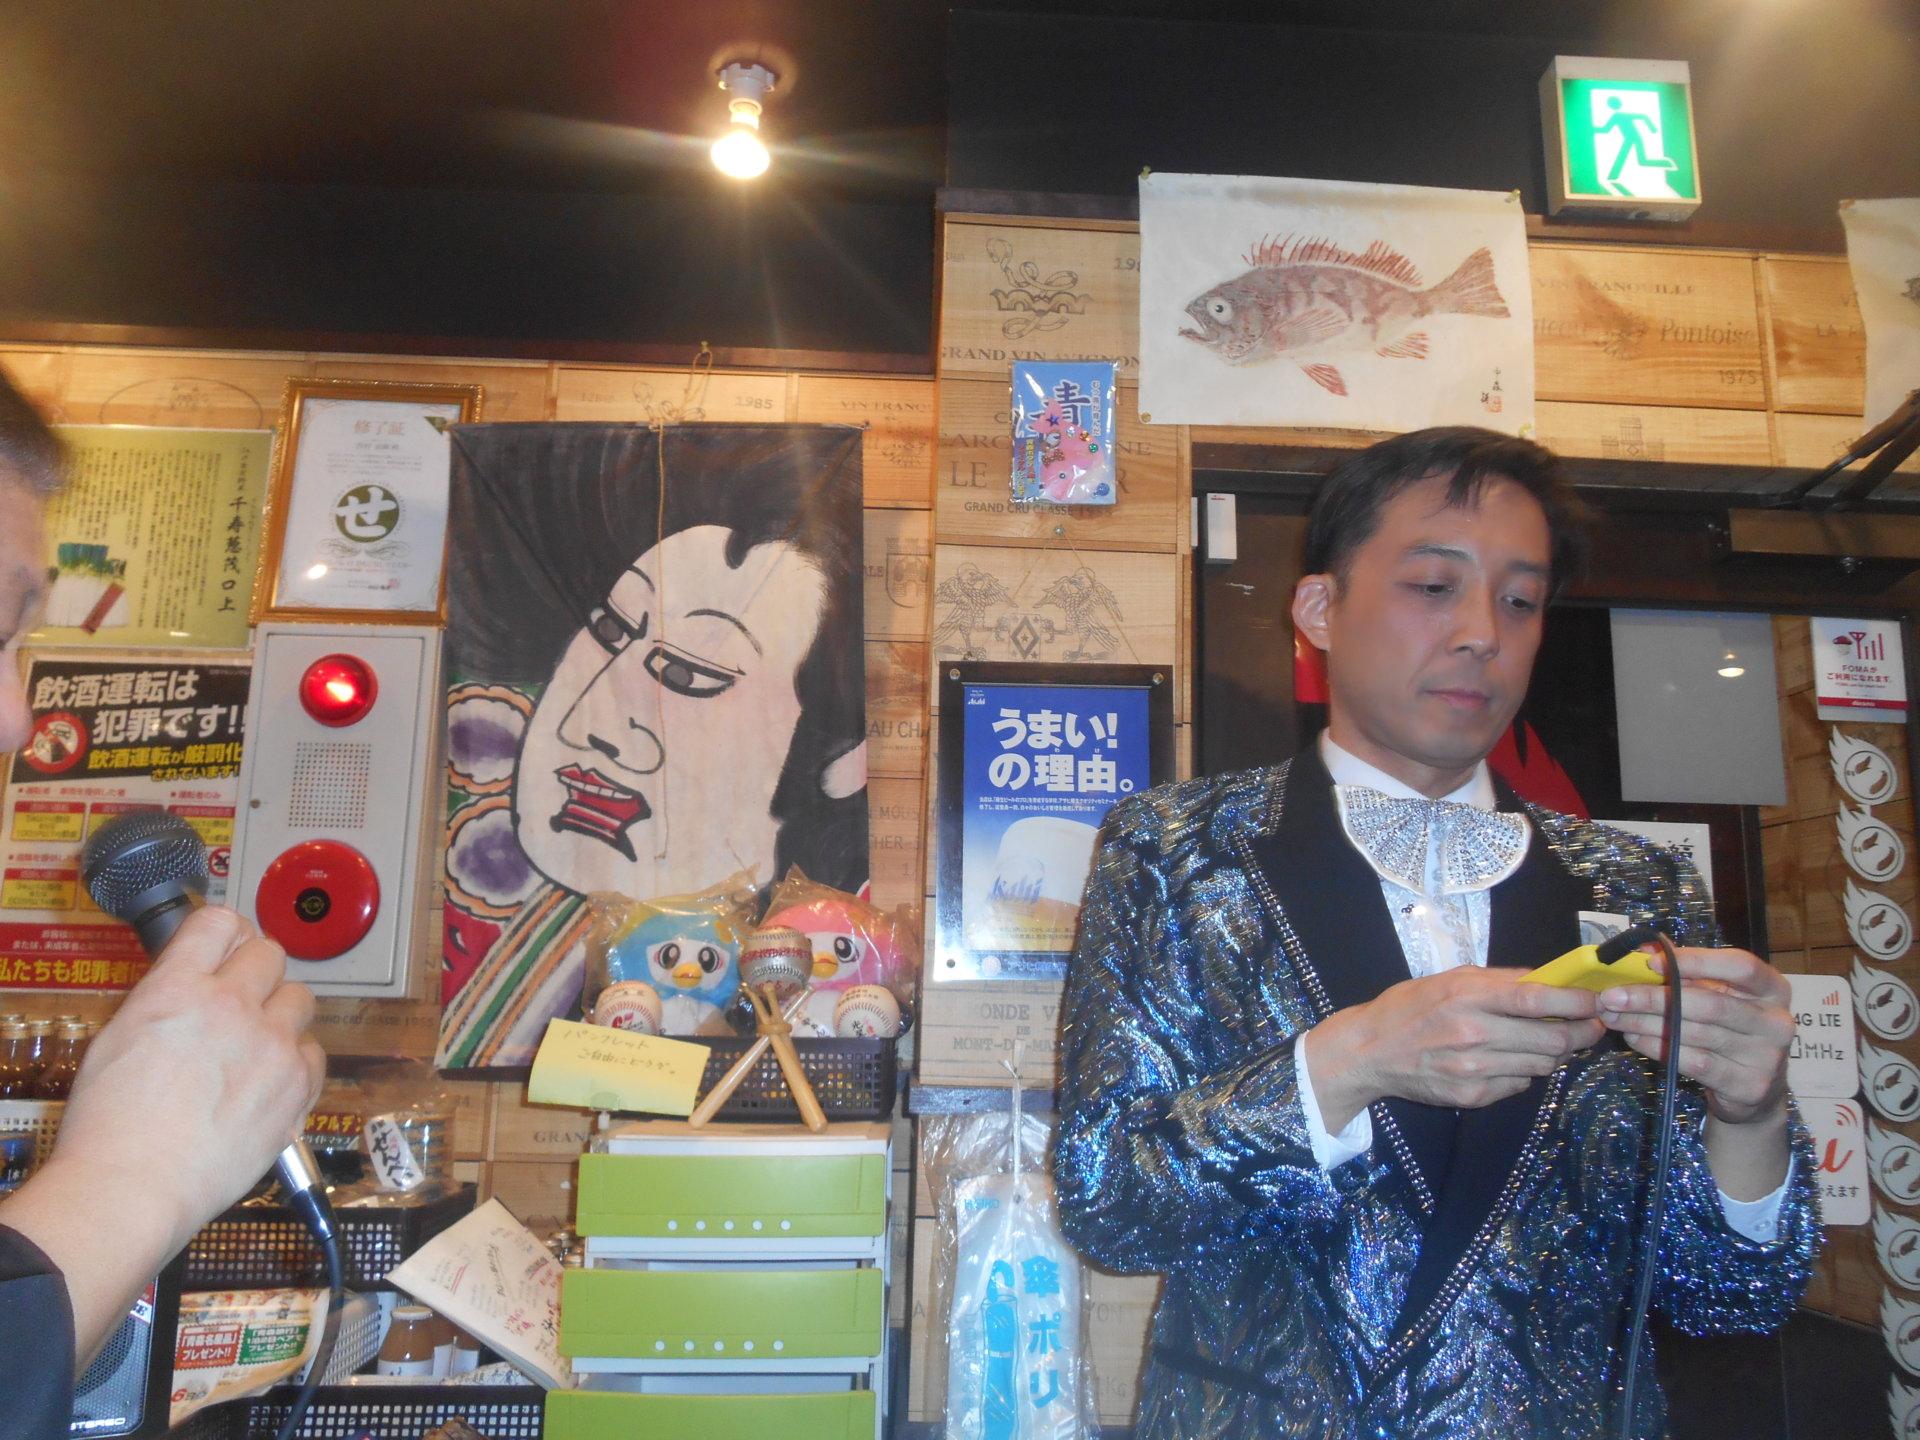 DSCN0620 1920x1440 - 2015年12月21日(月) AOsuki忘年会開催しました。